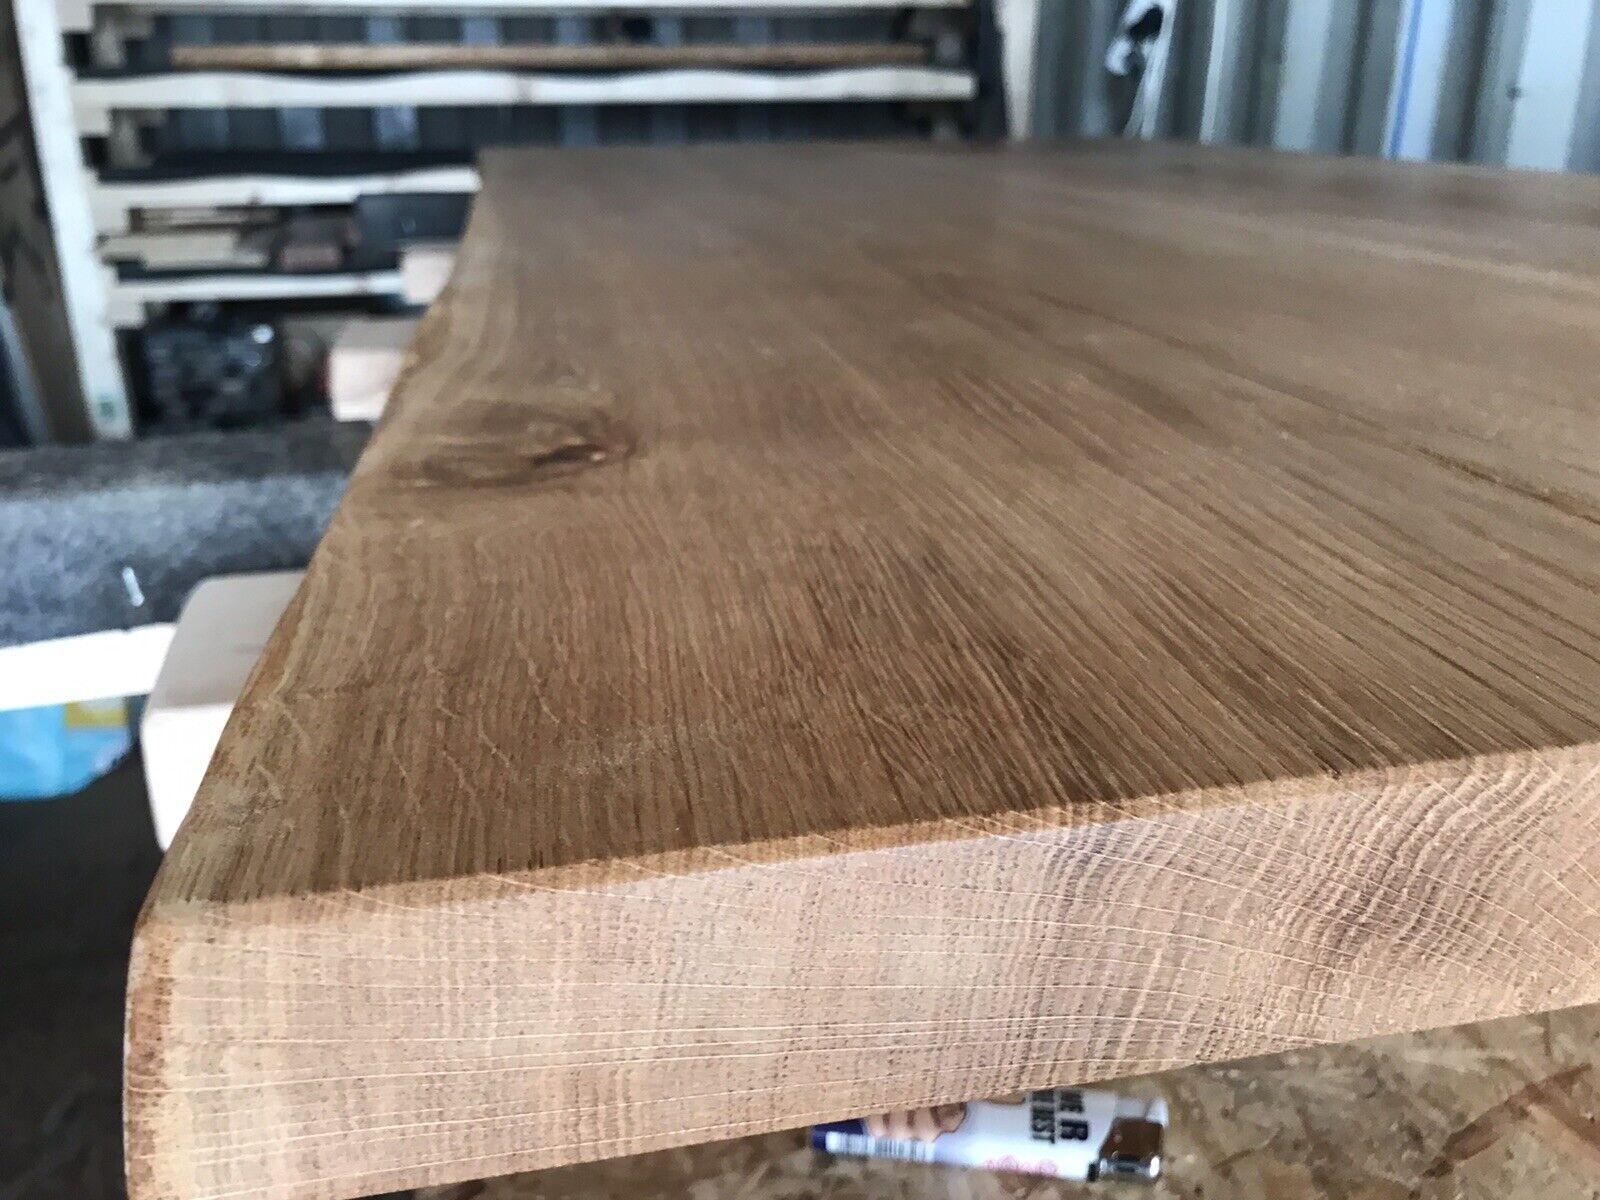 Massivholz Tischplatte Esstisch Baumkante Eiche rustikal geölt 180 x 90 cm 40mm 1